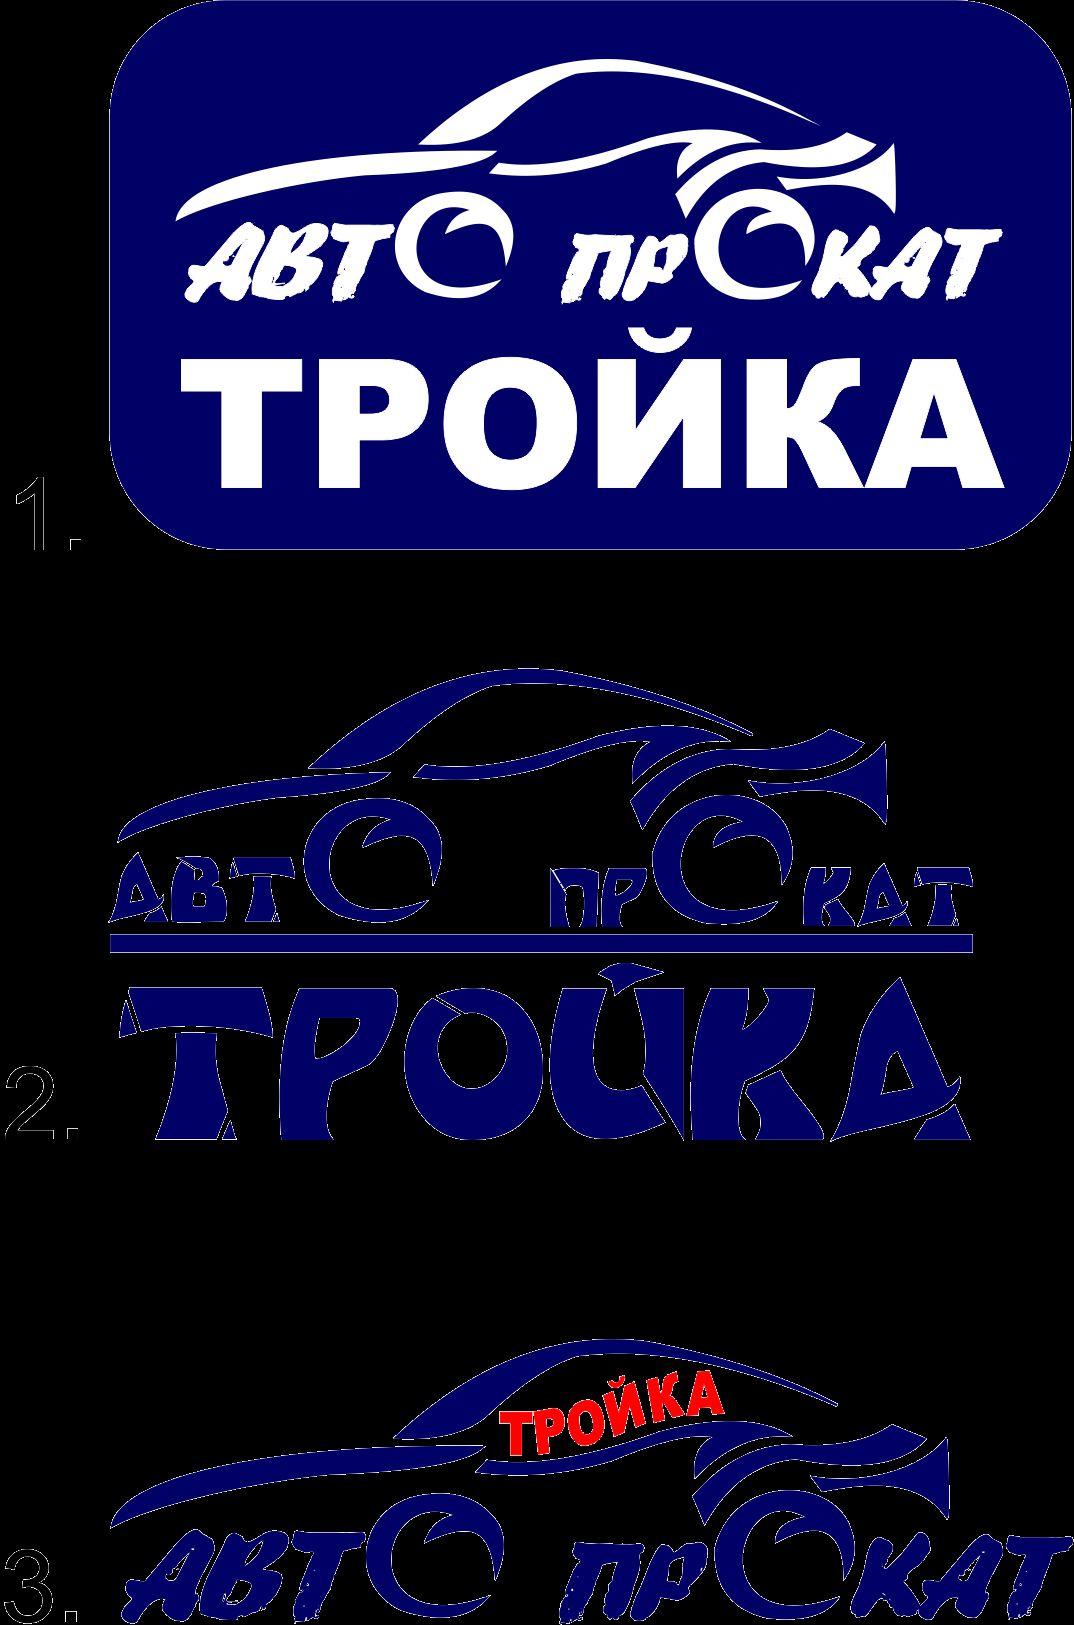 Логотип для компании проката автомобилей - дизайнер Ksushka1992